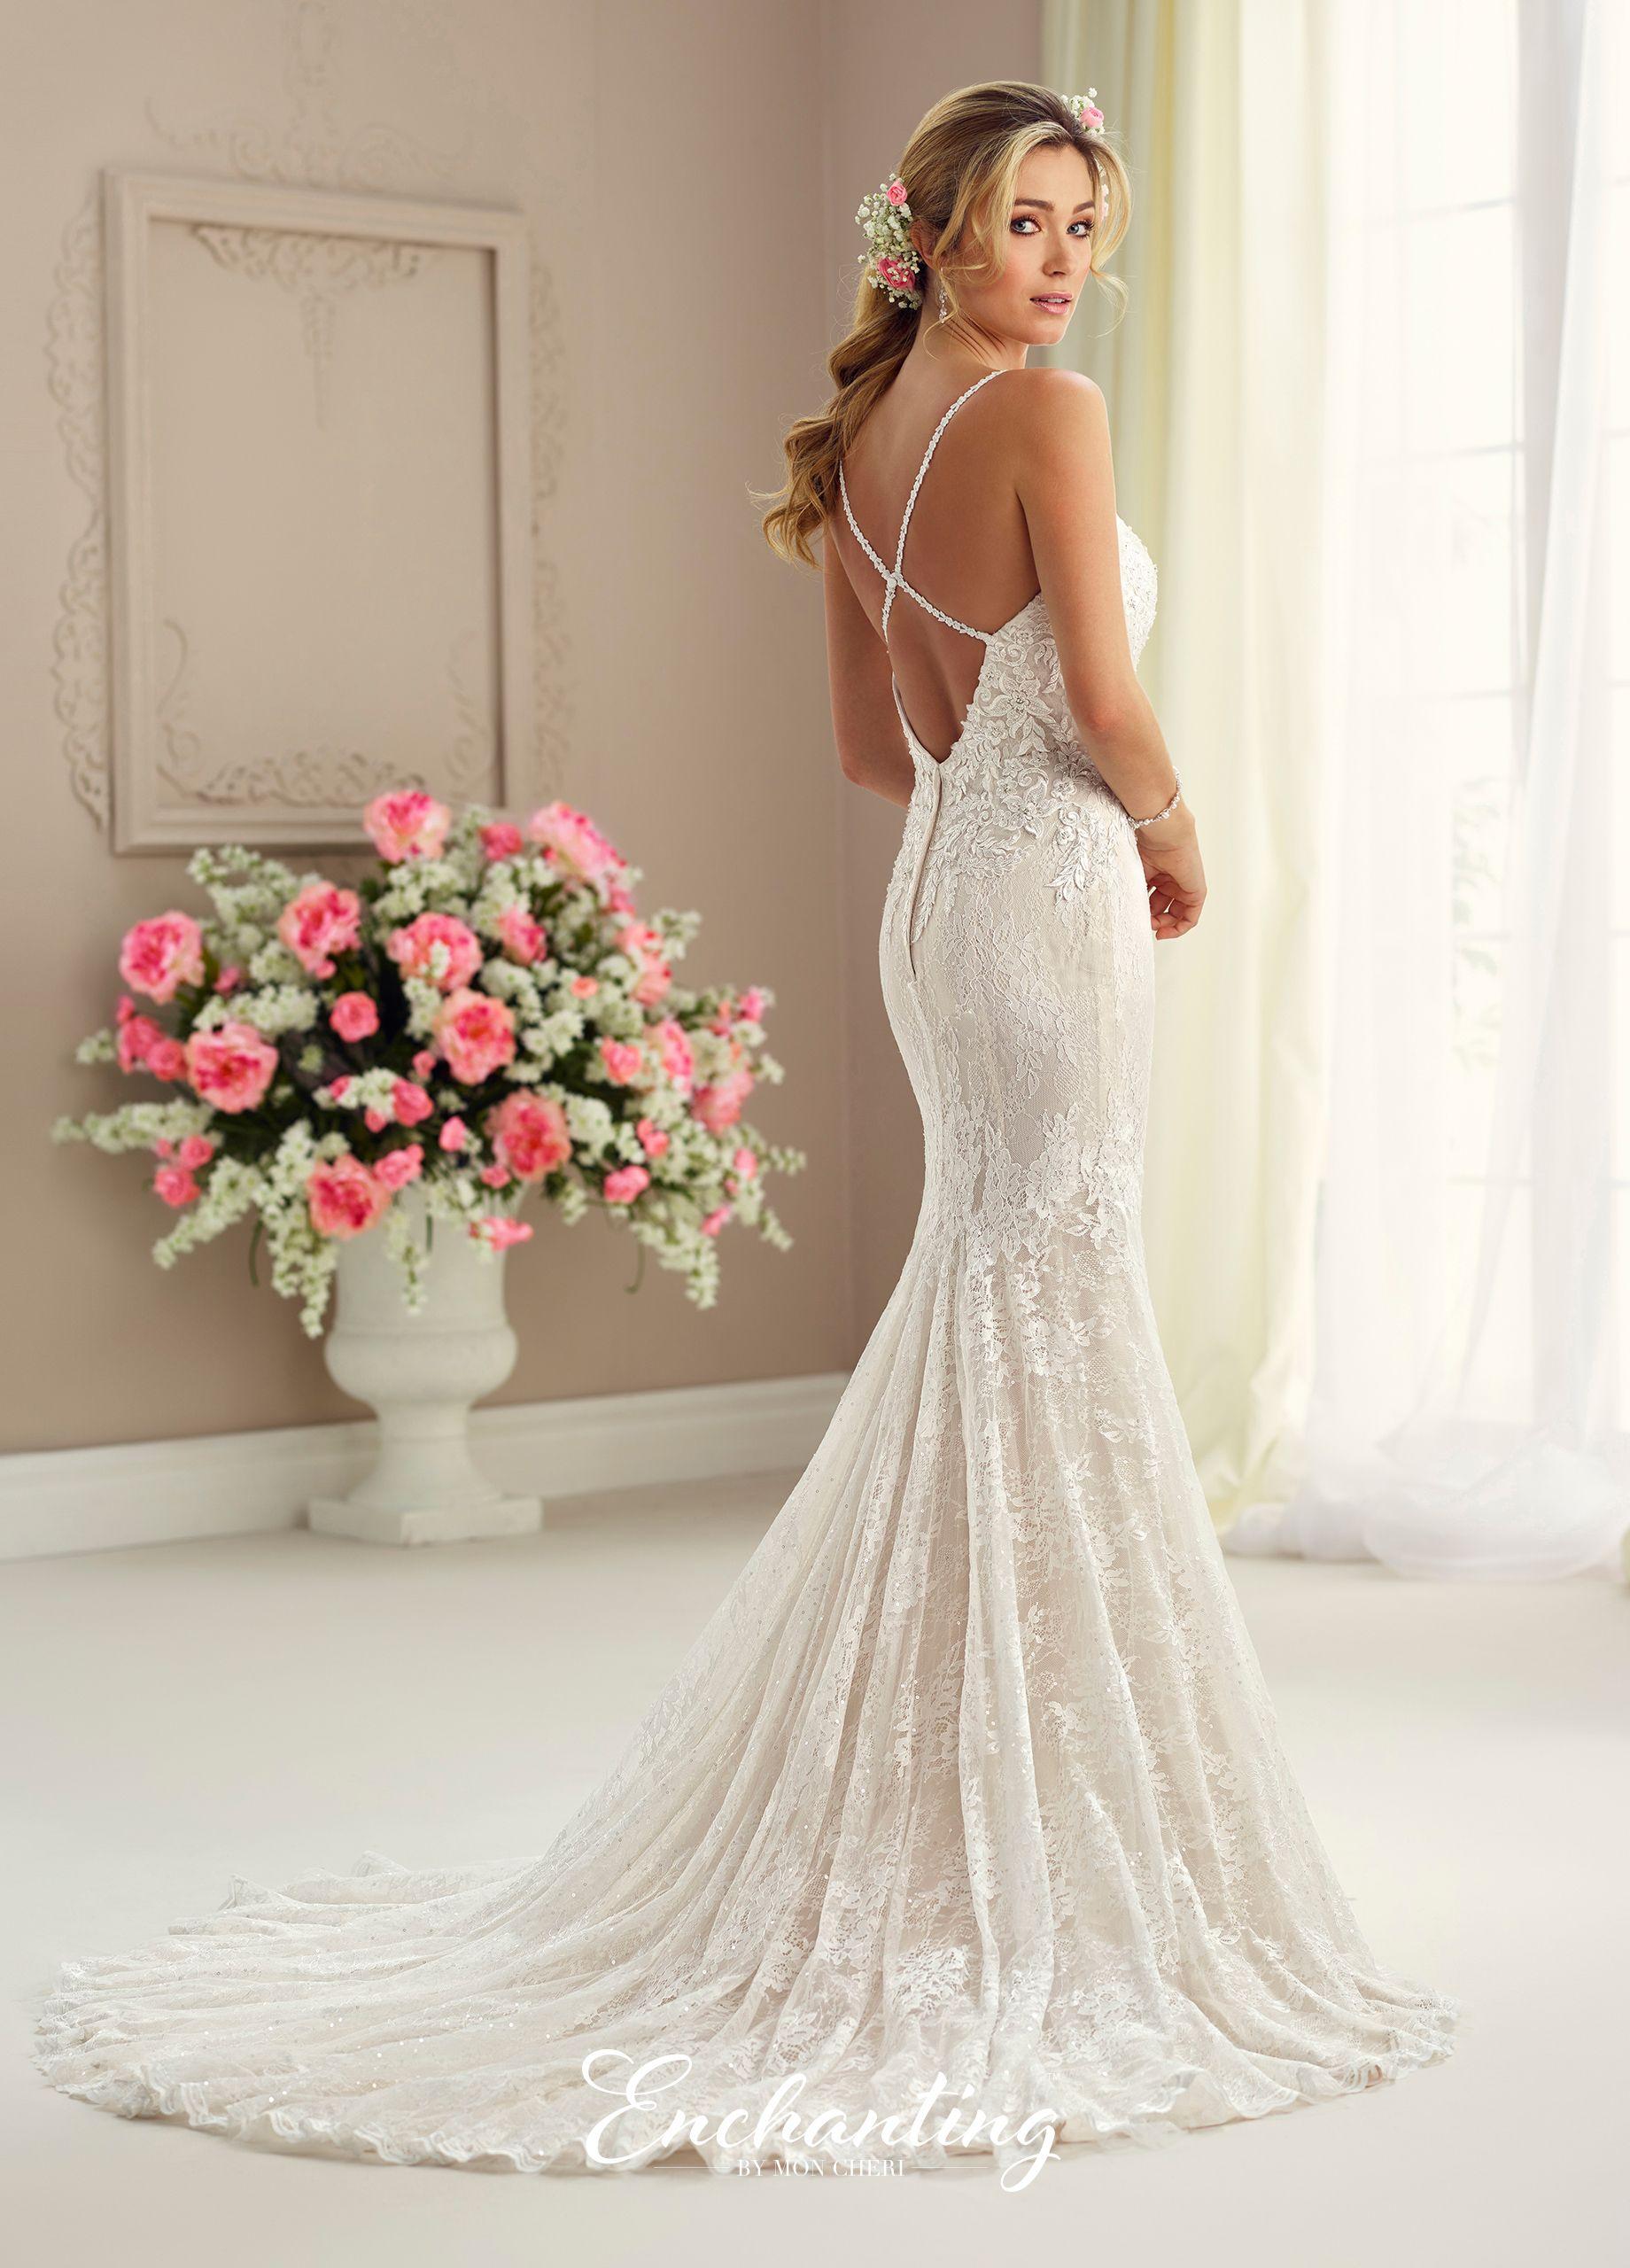 Enchanting By Mon Cheri 217107 Wedding Dress Inspiration Wedding Dresses Unique Destination Wedding Dress